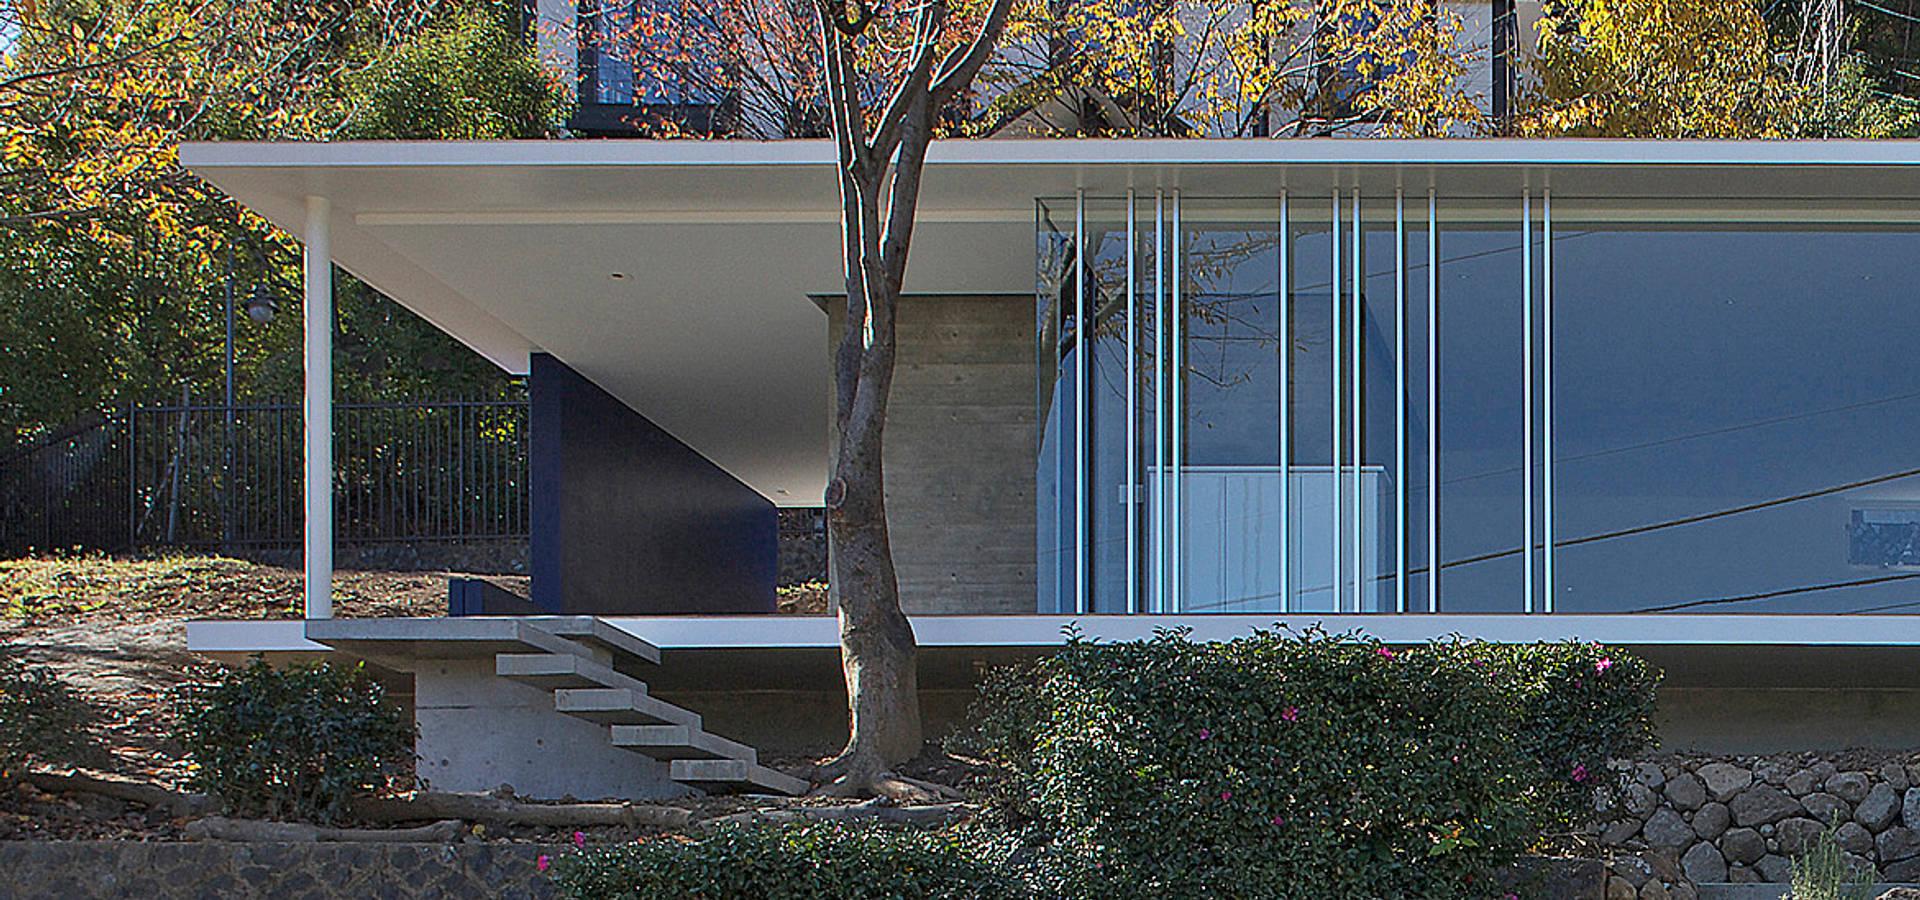 Archiplus Architectural Design Office / ㈱アーキプラス一級建築士事務所